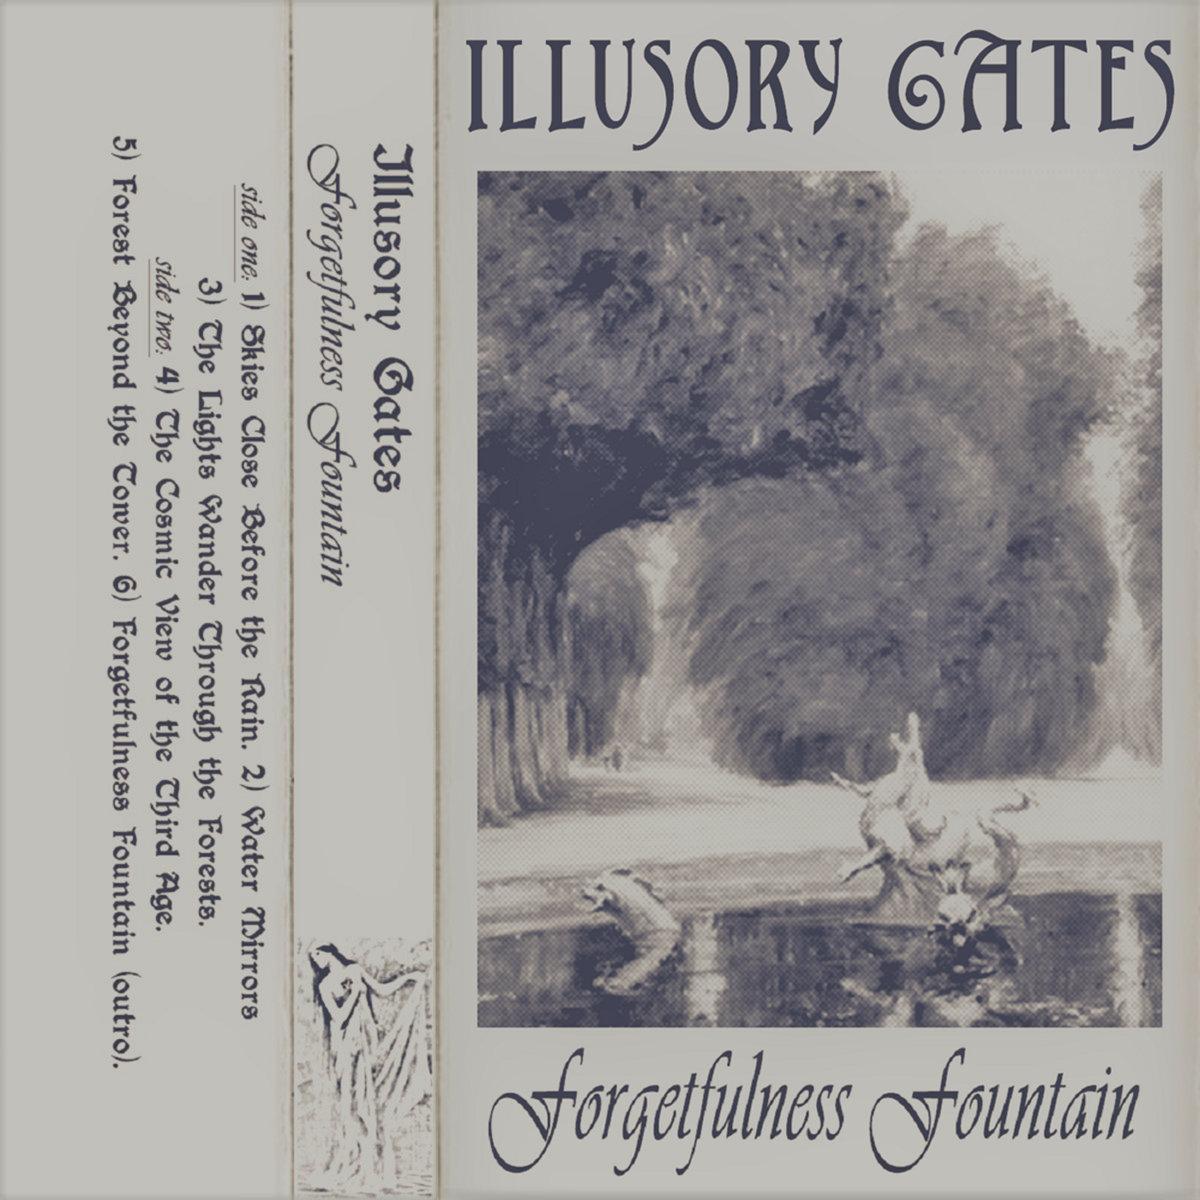 Forgetfulness Fountain